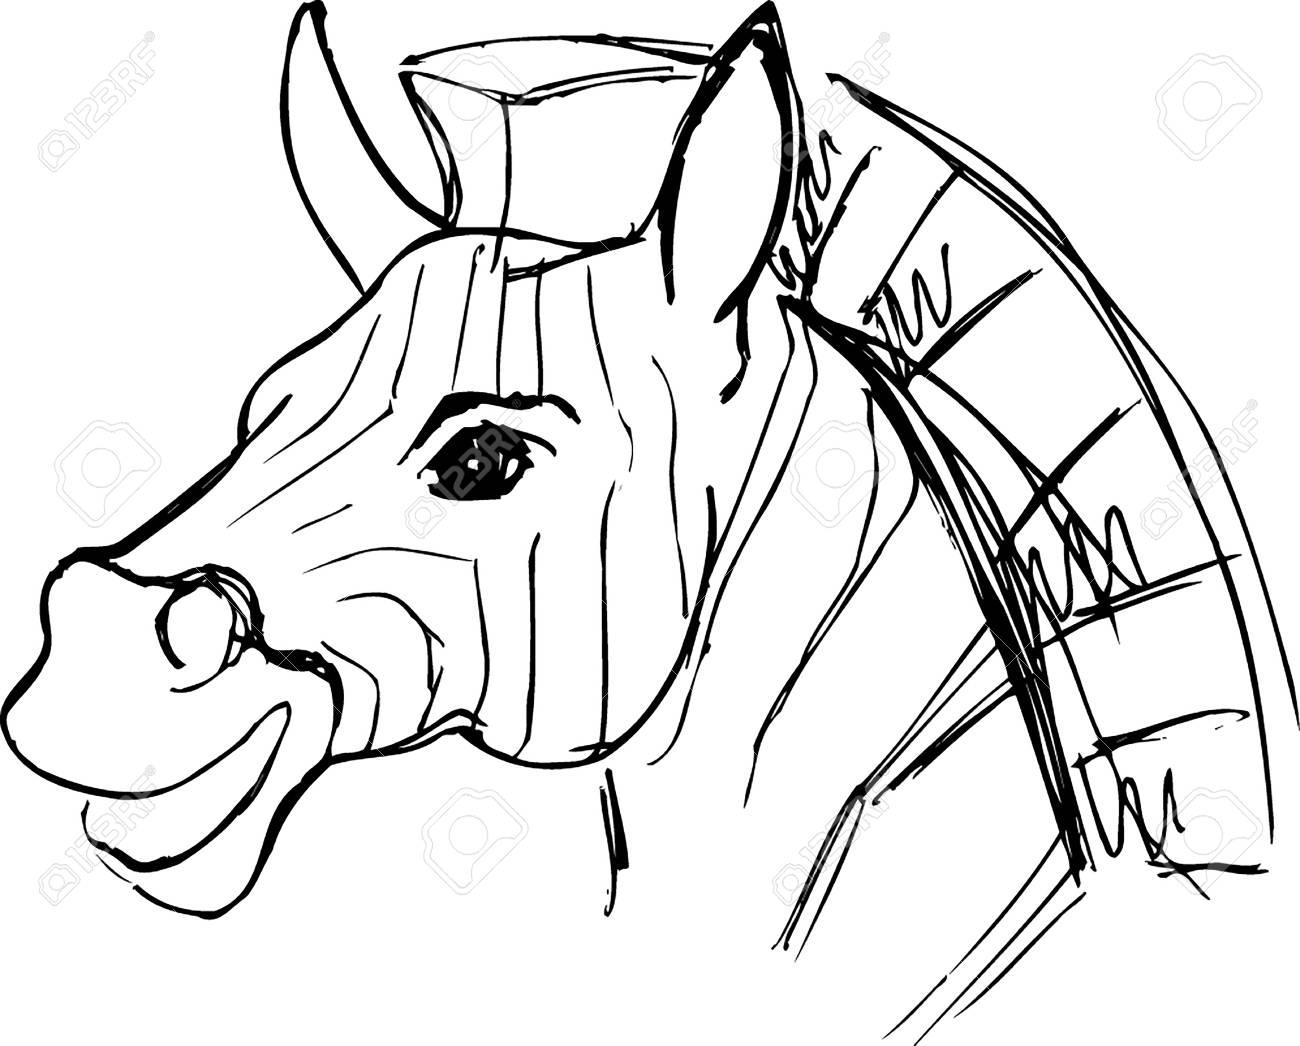 1300x1046 Drawing Sketch Of A Zebra Cartoon Portrait Royalty Free Cliparts